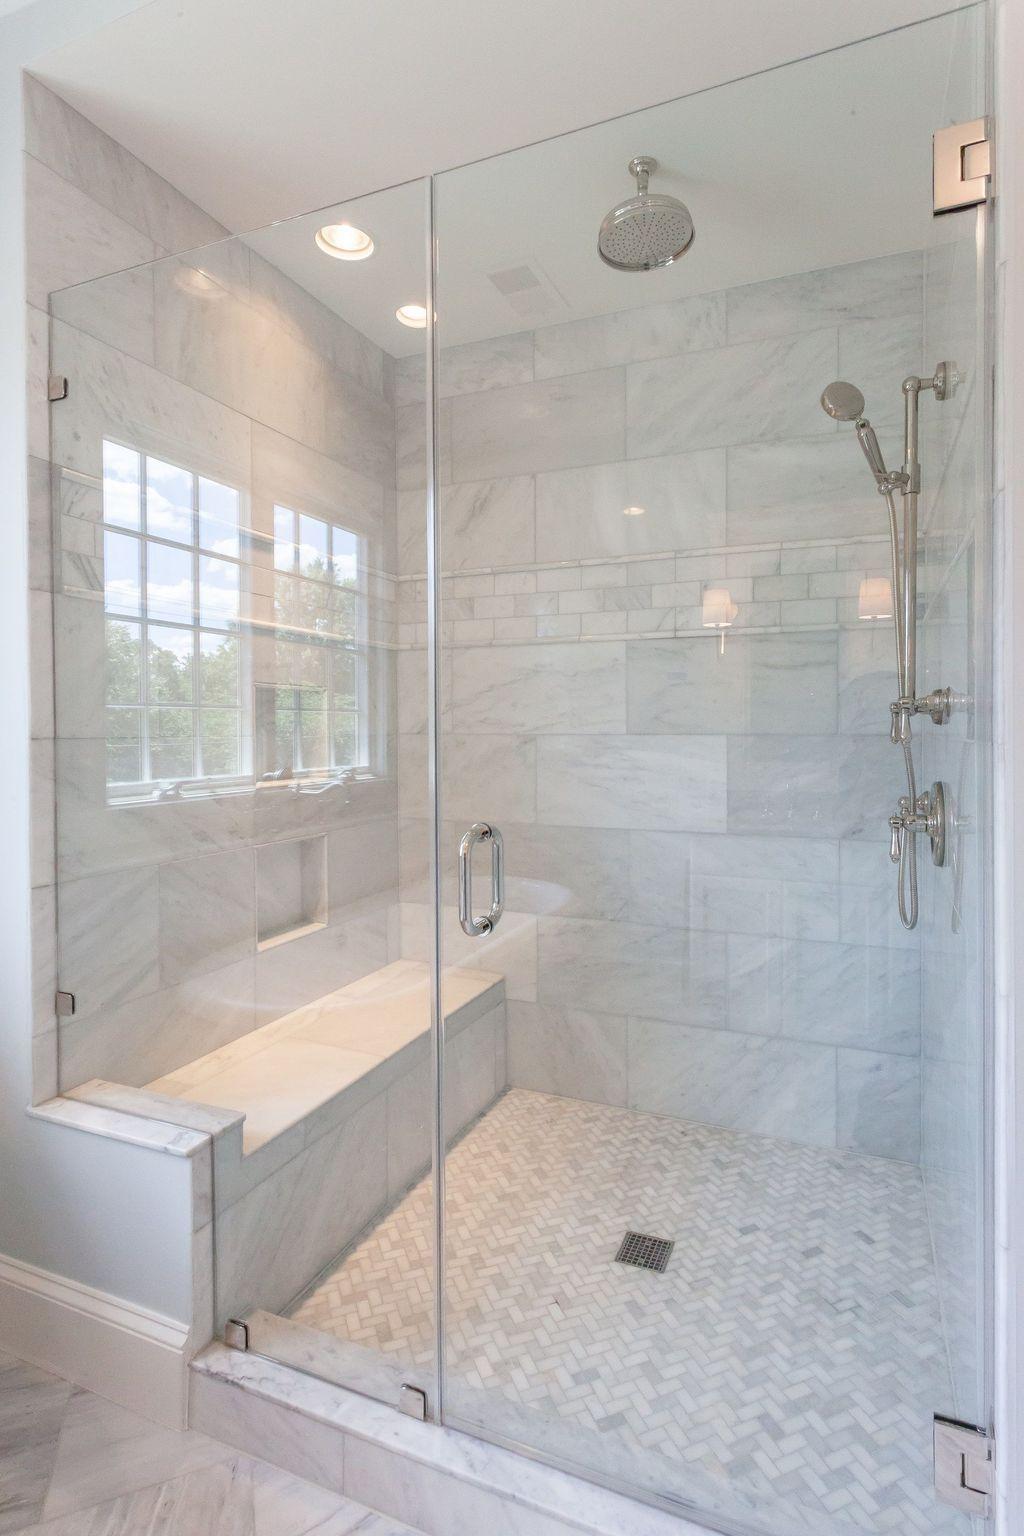 Unusual Master Bathroom Remodel Ideas 29 In 2020 Bathroom Remodel Shower Master Bathroom Design Master Bathroom Shower